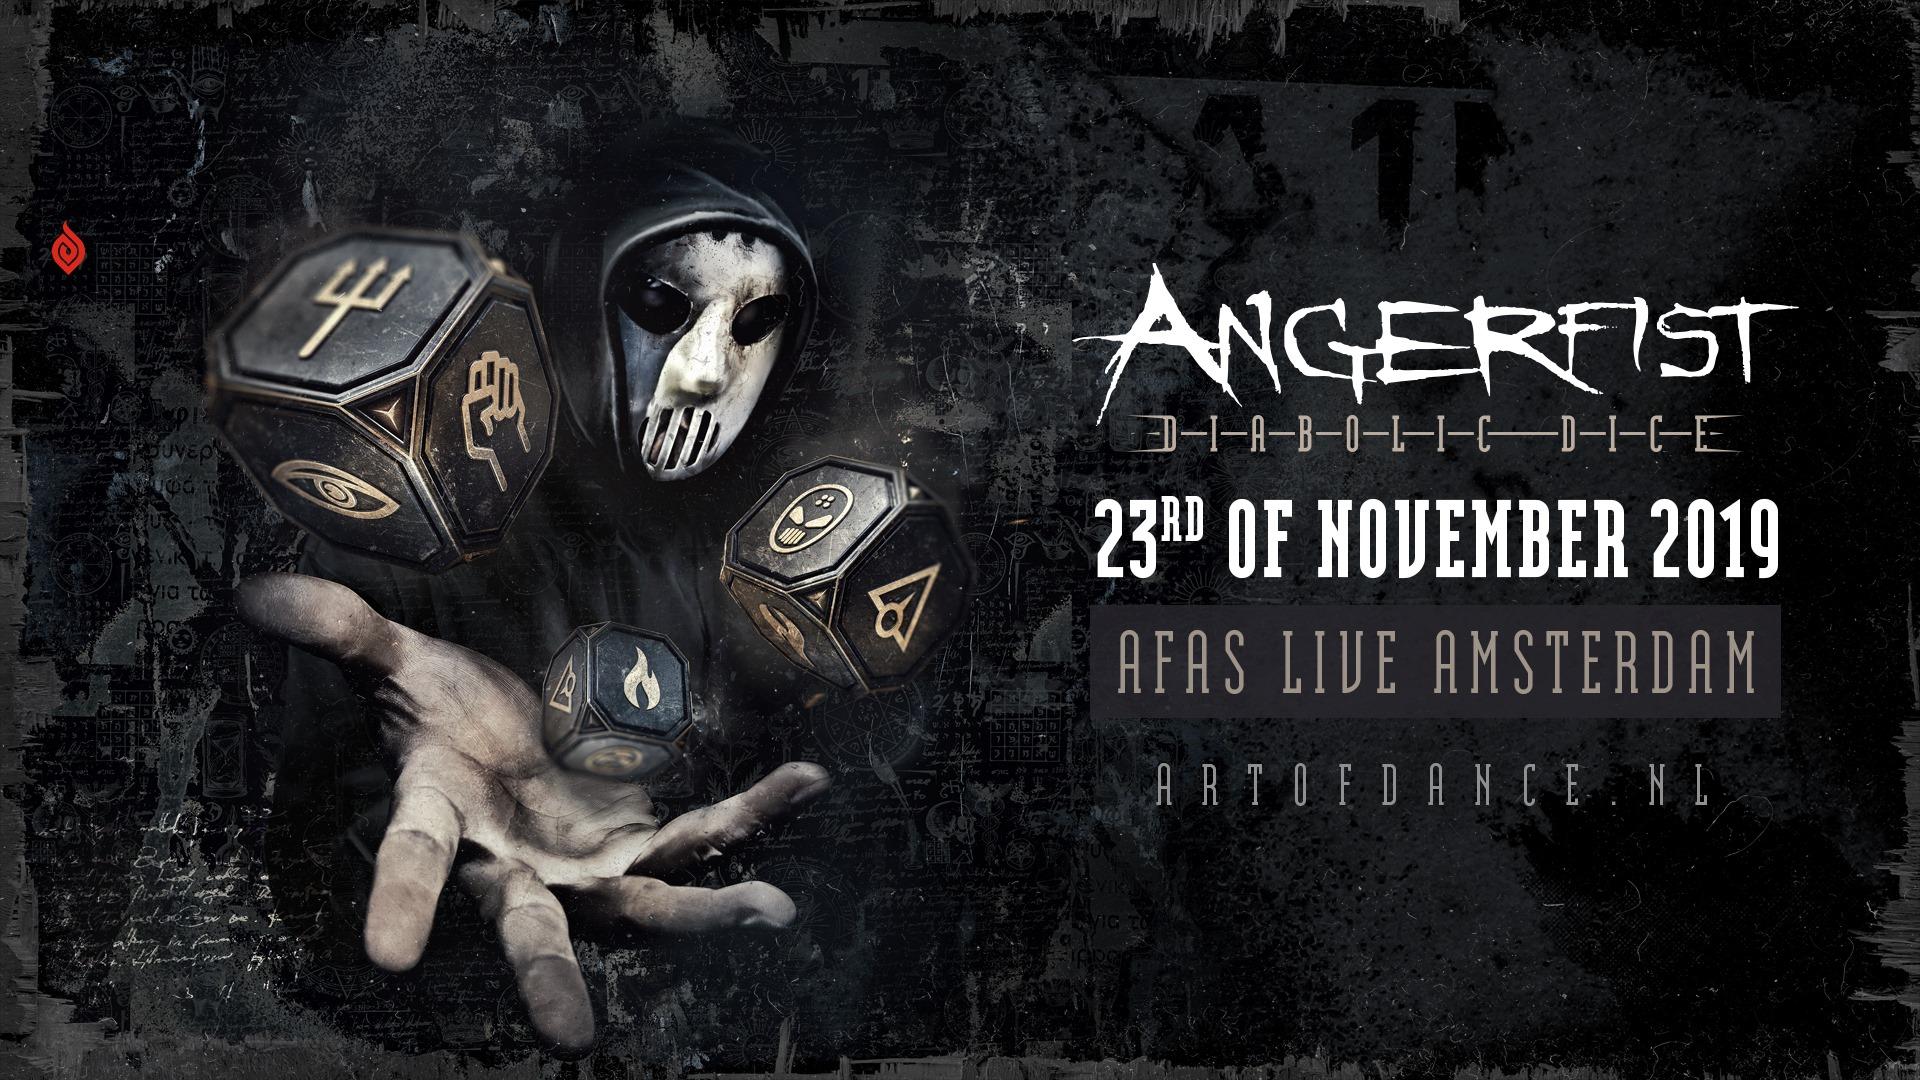 Angerfist 2019 - Diabolic Dice